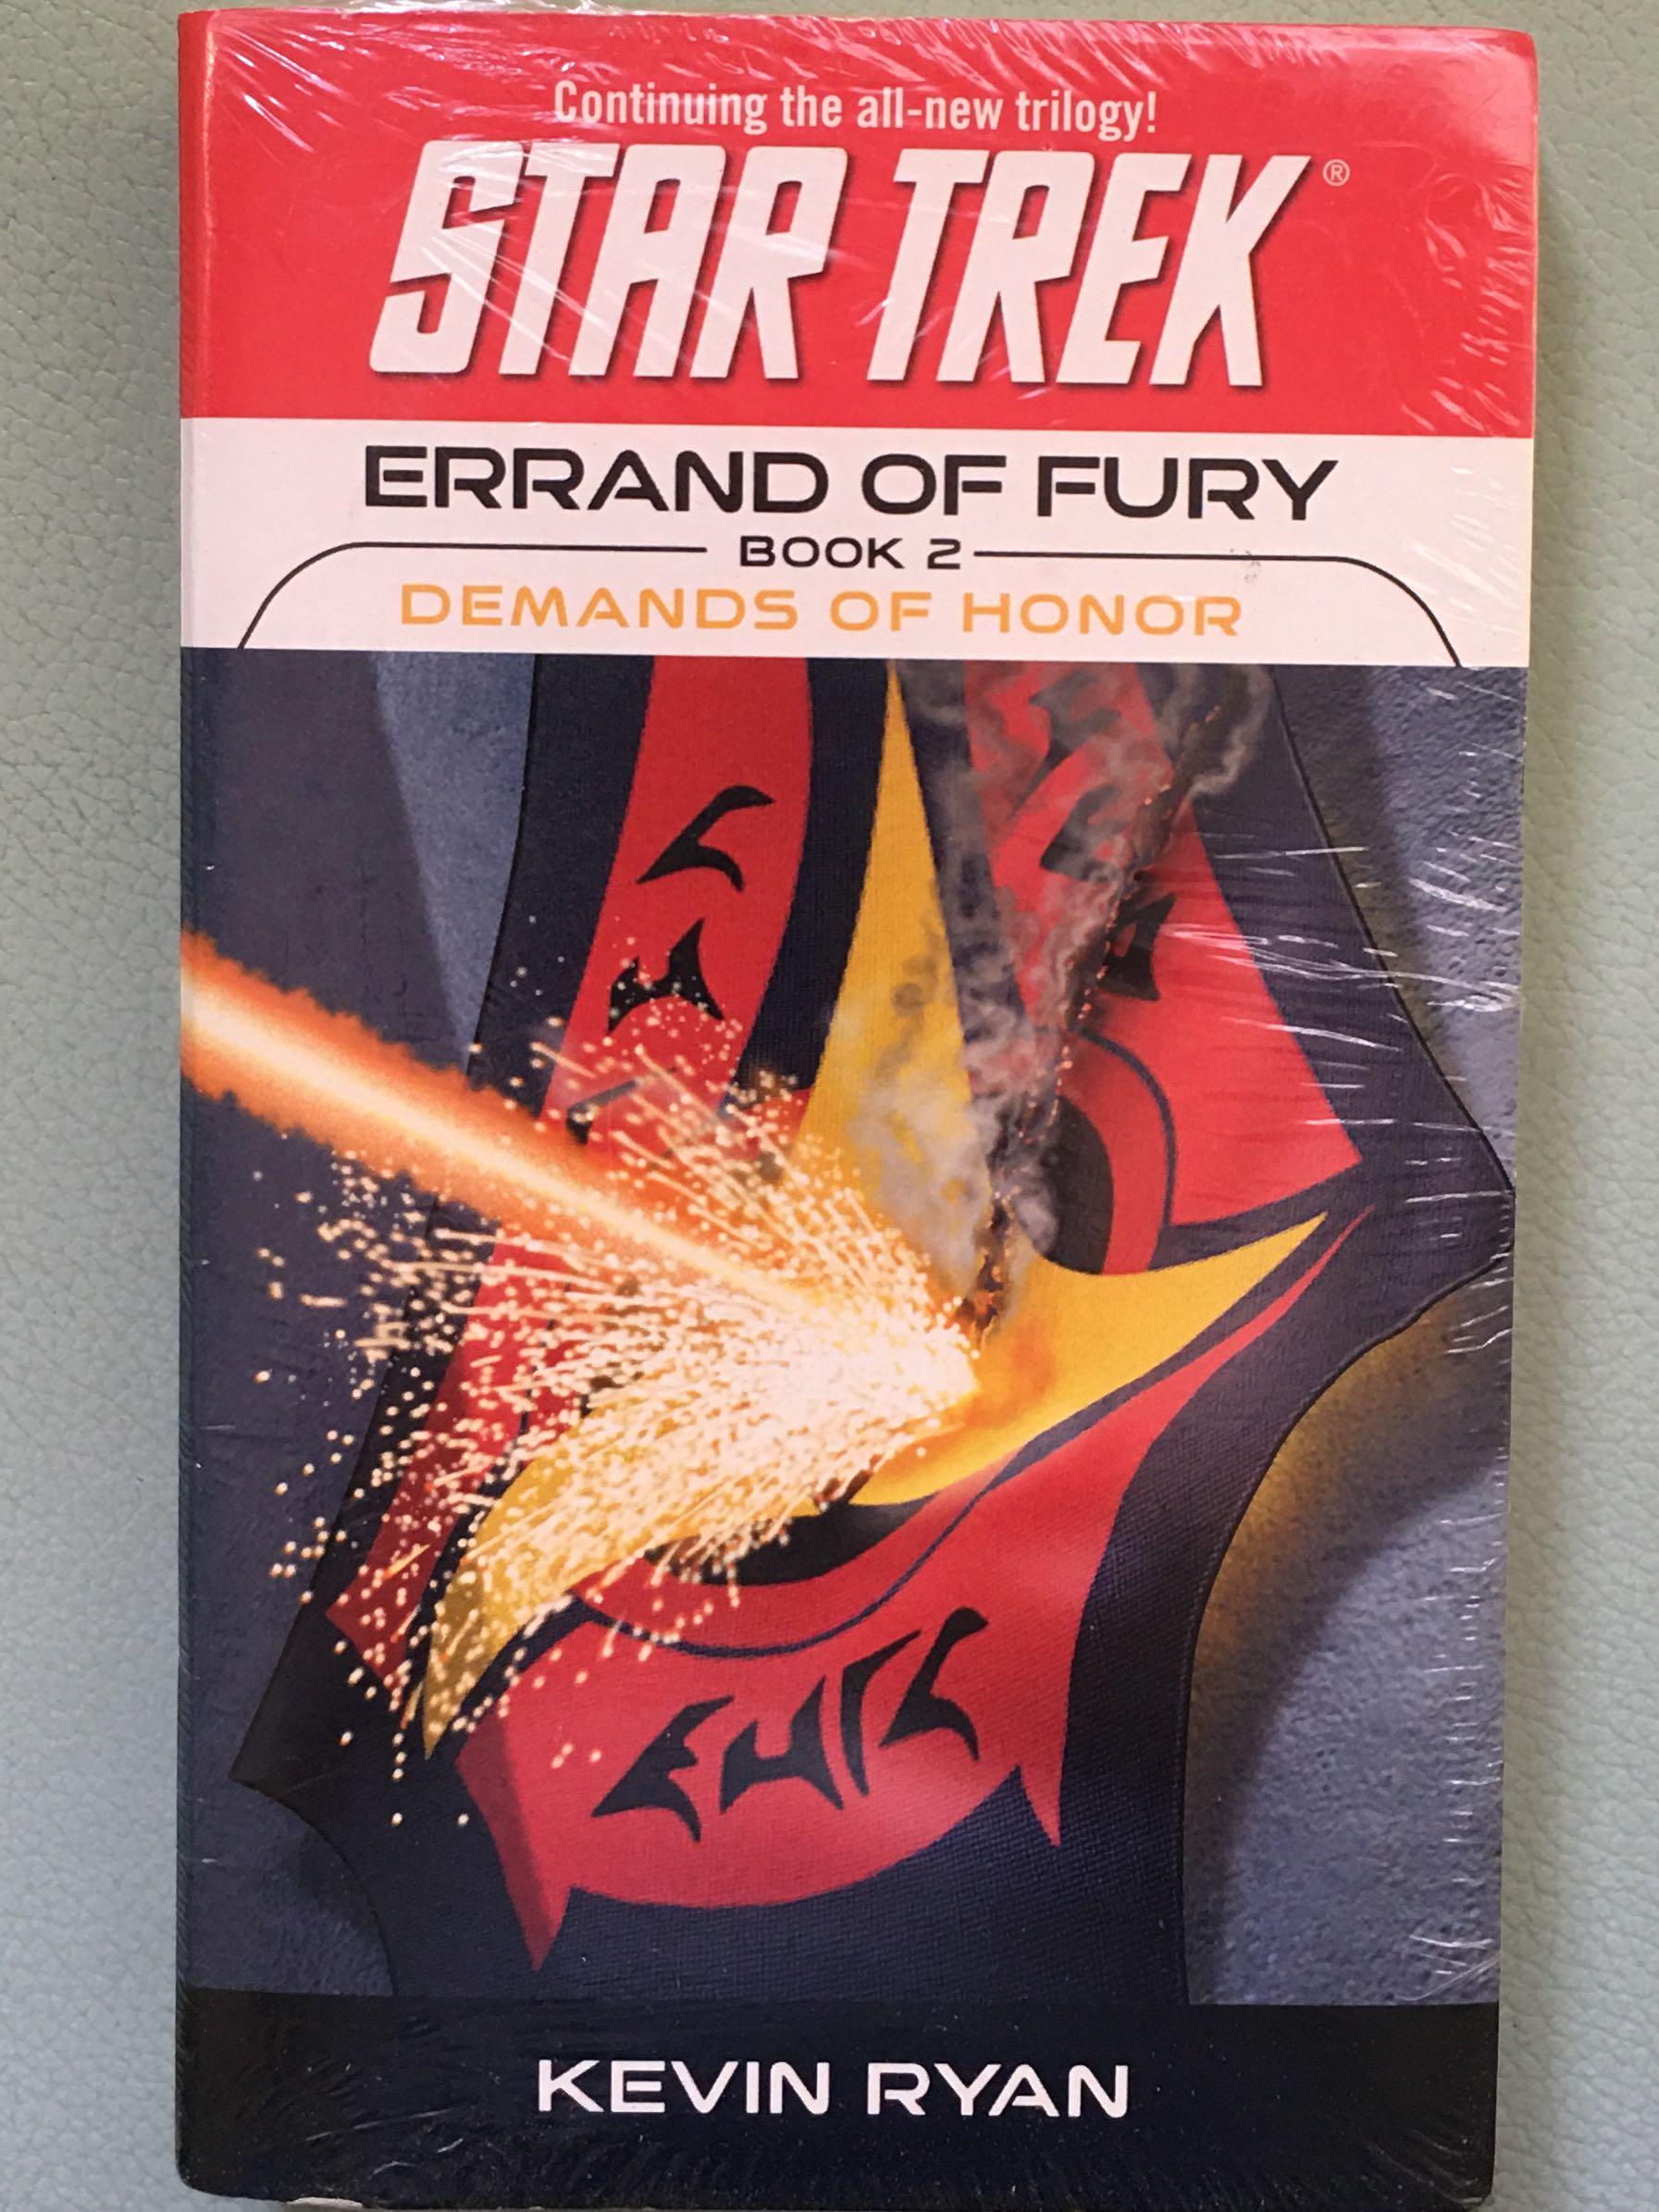 KEVIN RYAN_STAR TREK: Errands of Fury_Book 2- Demands of Honor